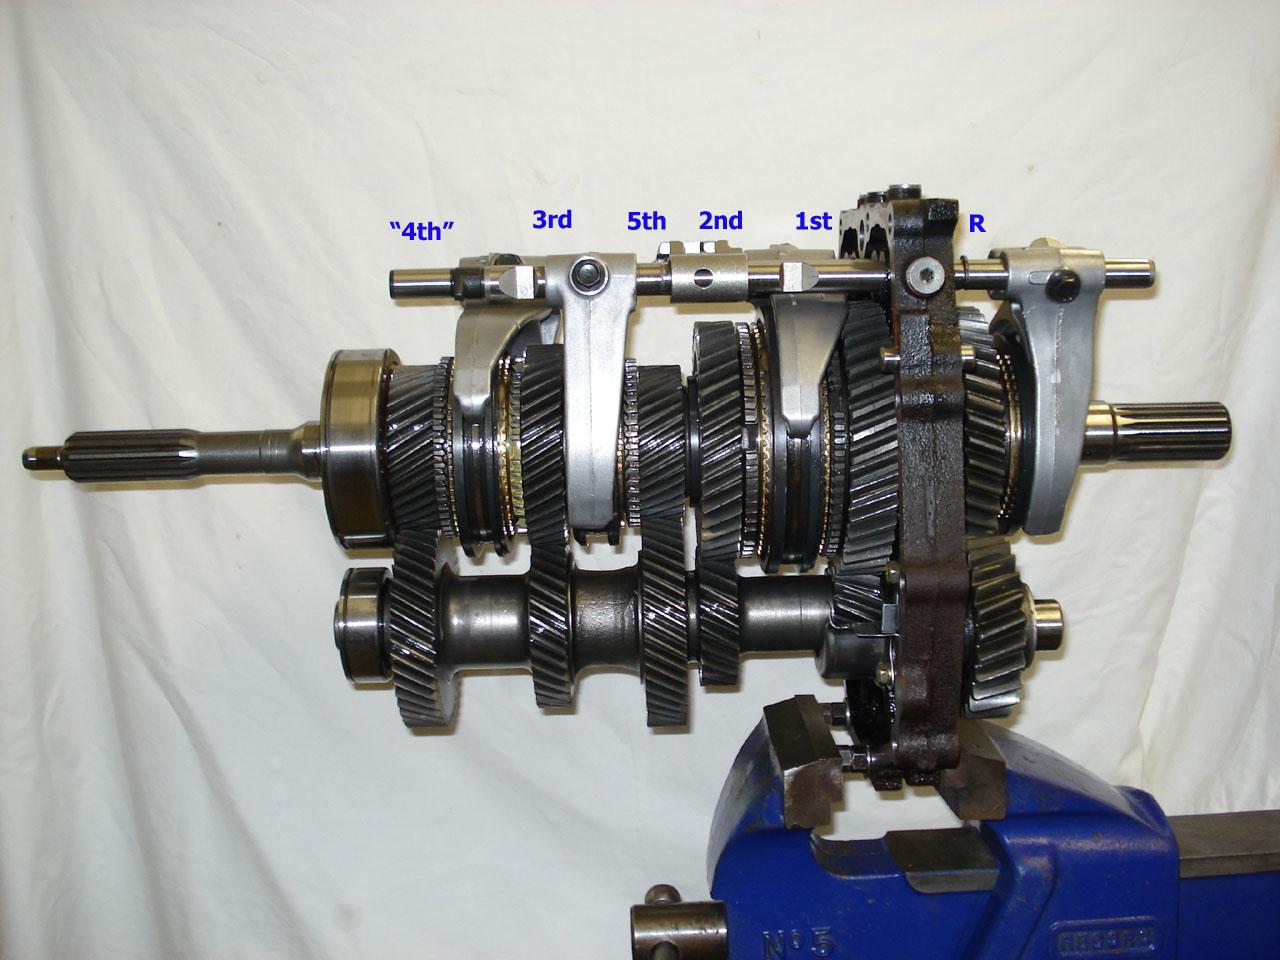 gm wiring diagrams for dummies suzuki savage 650 carburetor diagram chevy chevette engine swap ~ elsavadorla